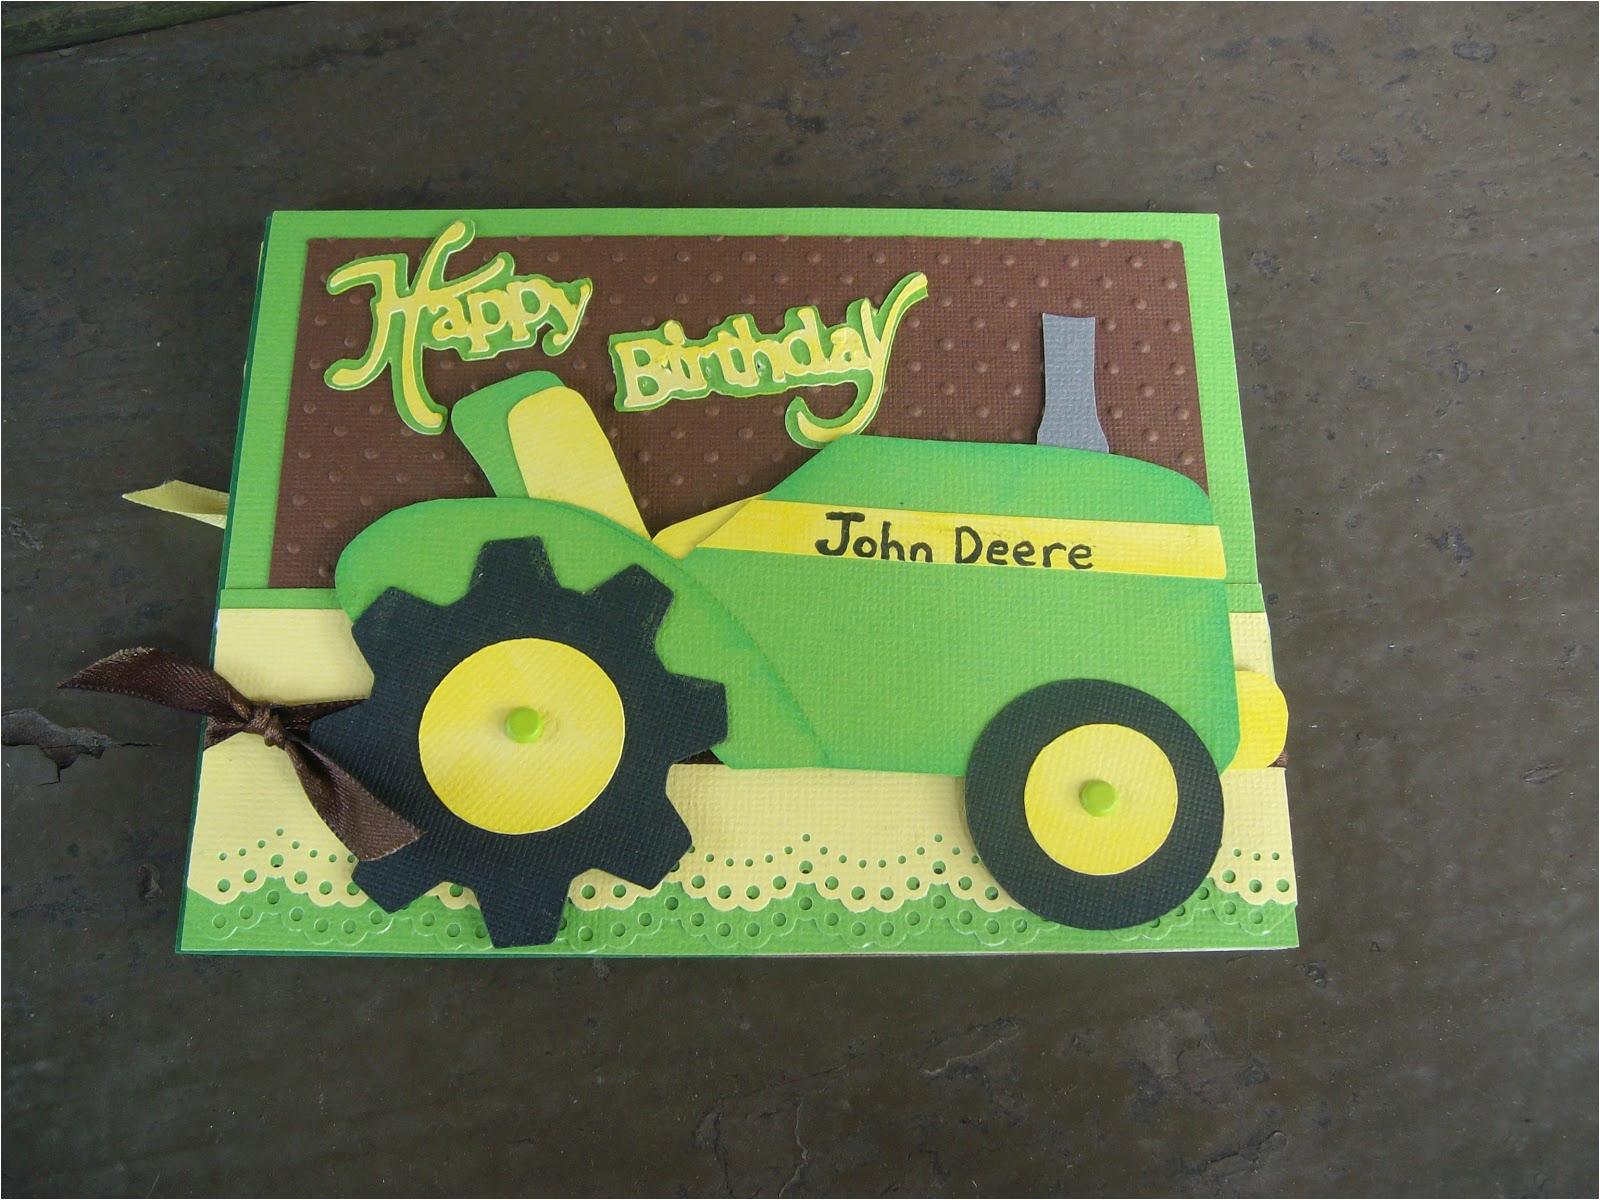 john deere happy birthday card